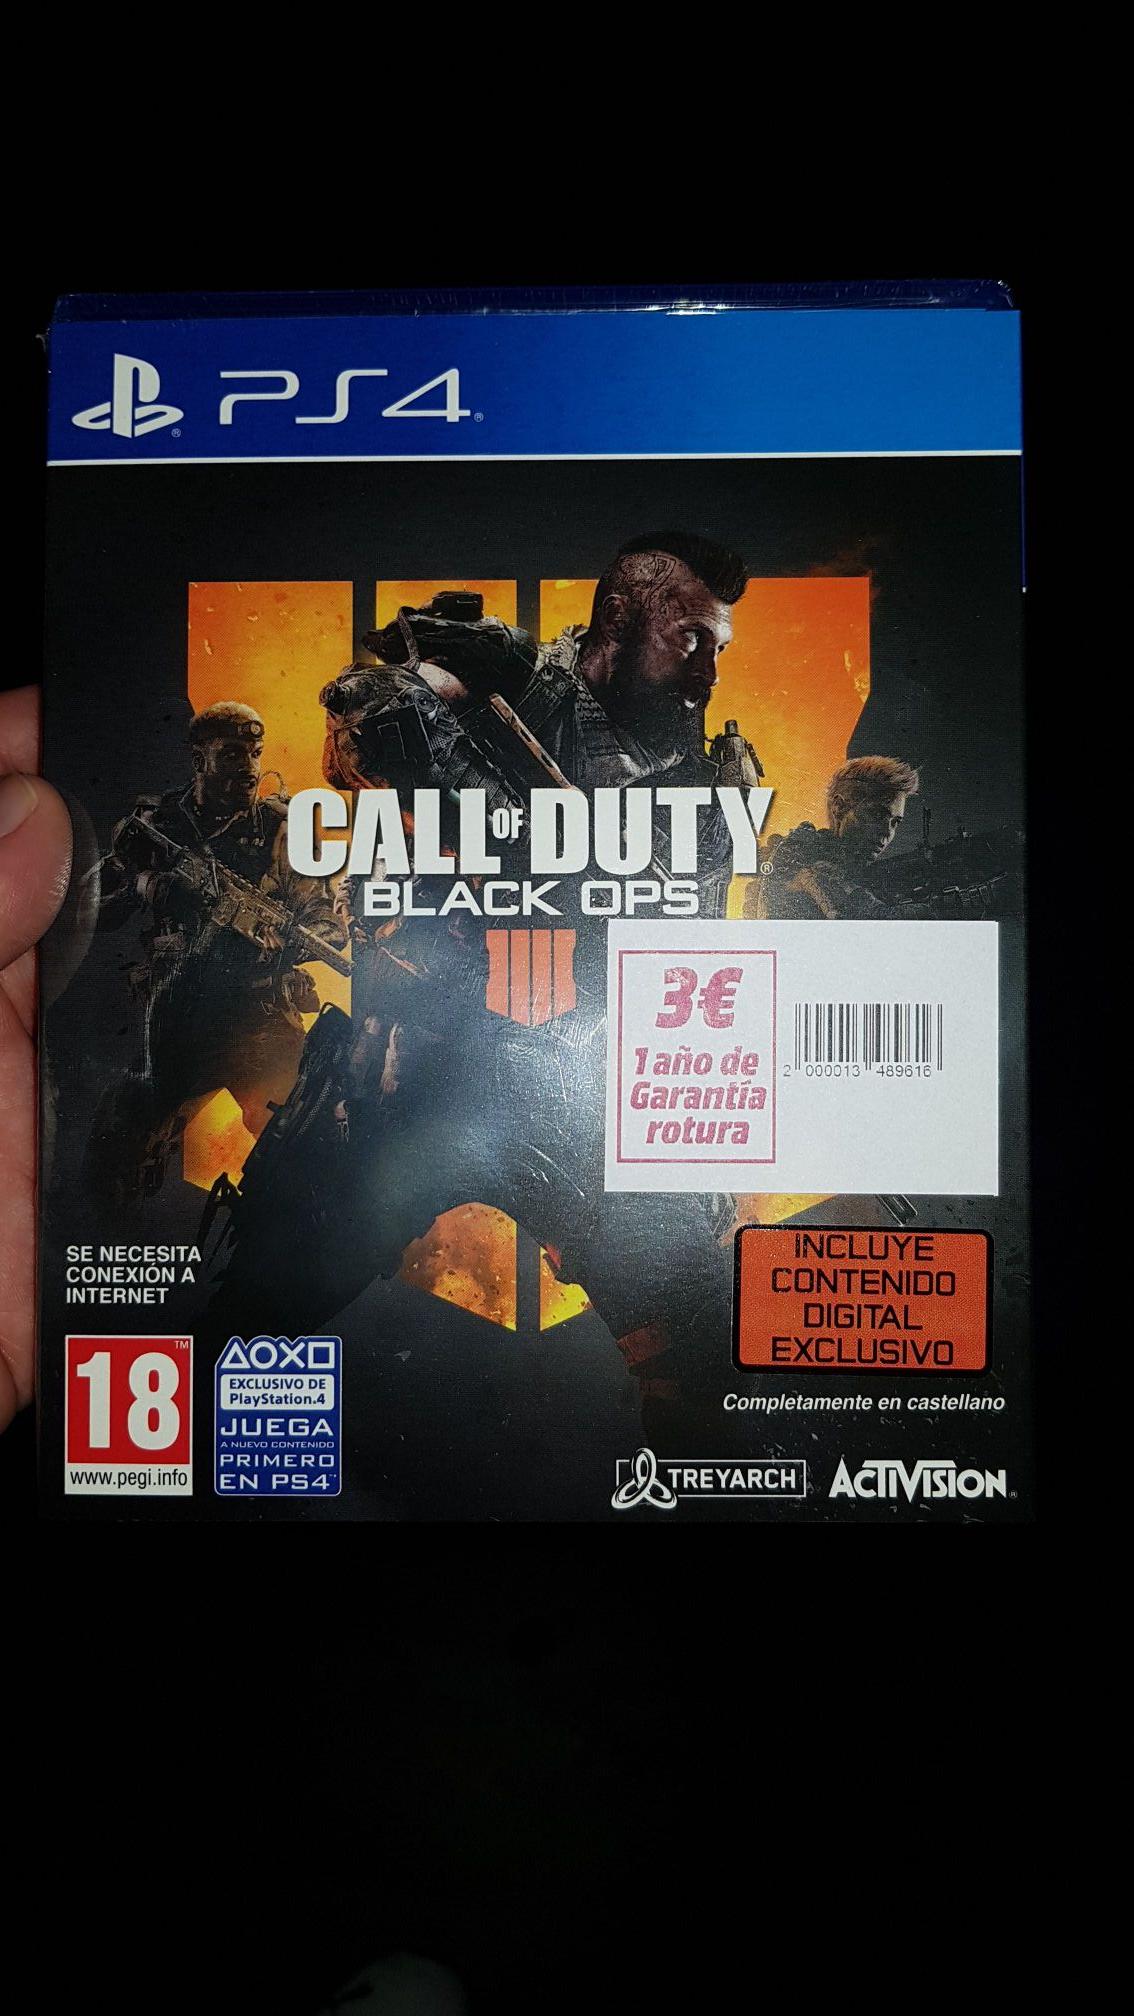 Call of Duty Black Ops para PS4